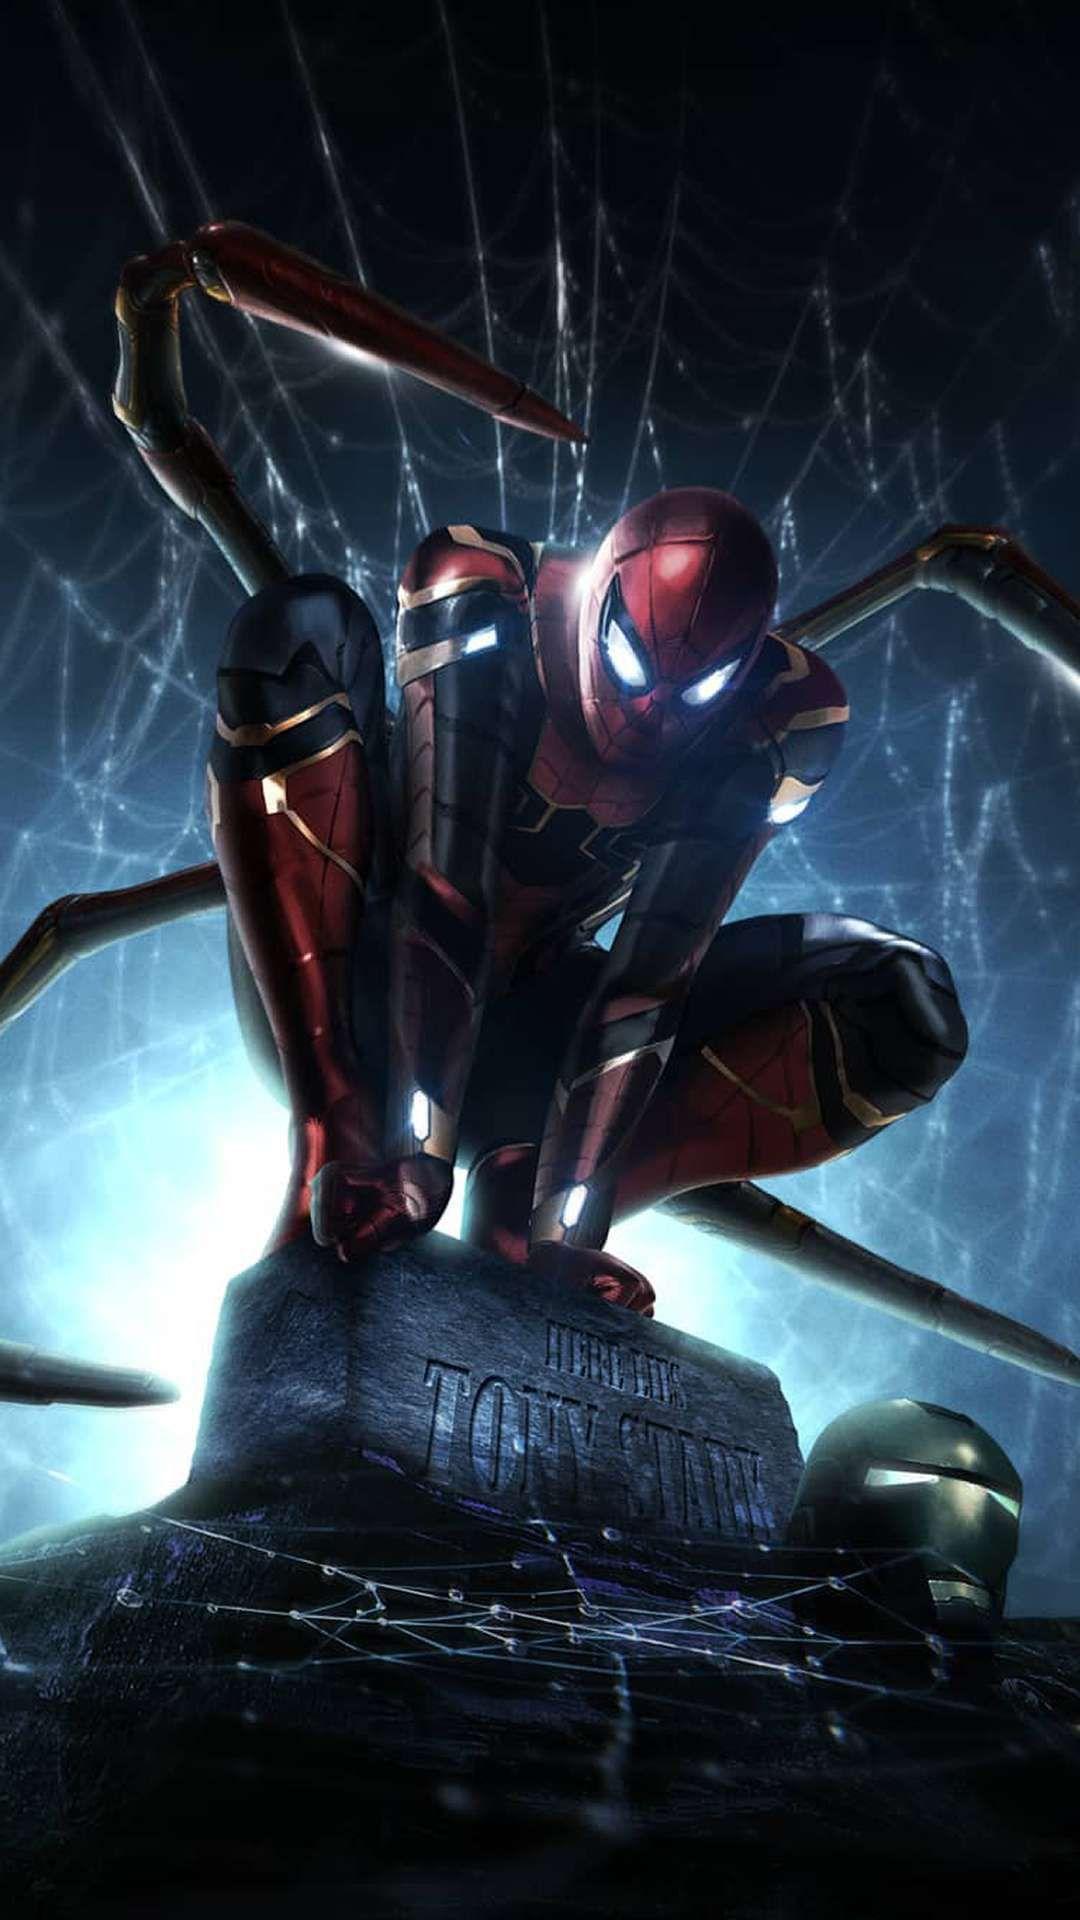 Spiderman And Ironman Wallpaper : spiderman, ironman, wallpaper, Universe,, Peter, Parker, #Spiderman, #superhero, #costume, #wallpaper, #poster, #iphone, #ironman, #spider, Marvel, Spiderman, Superhero, Posters,